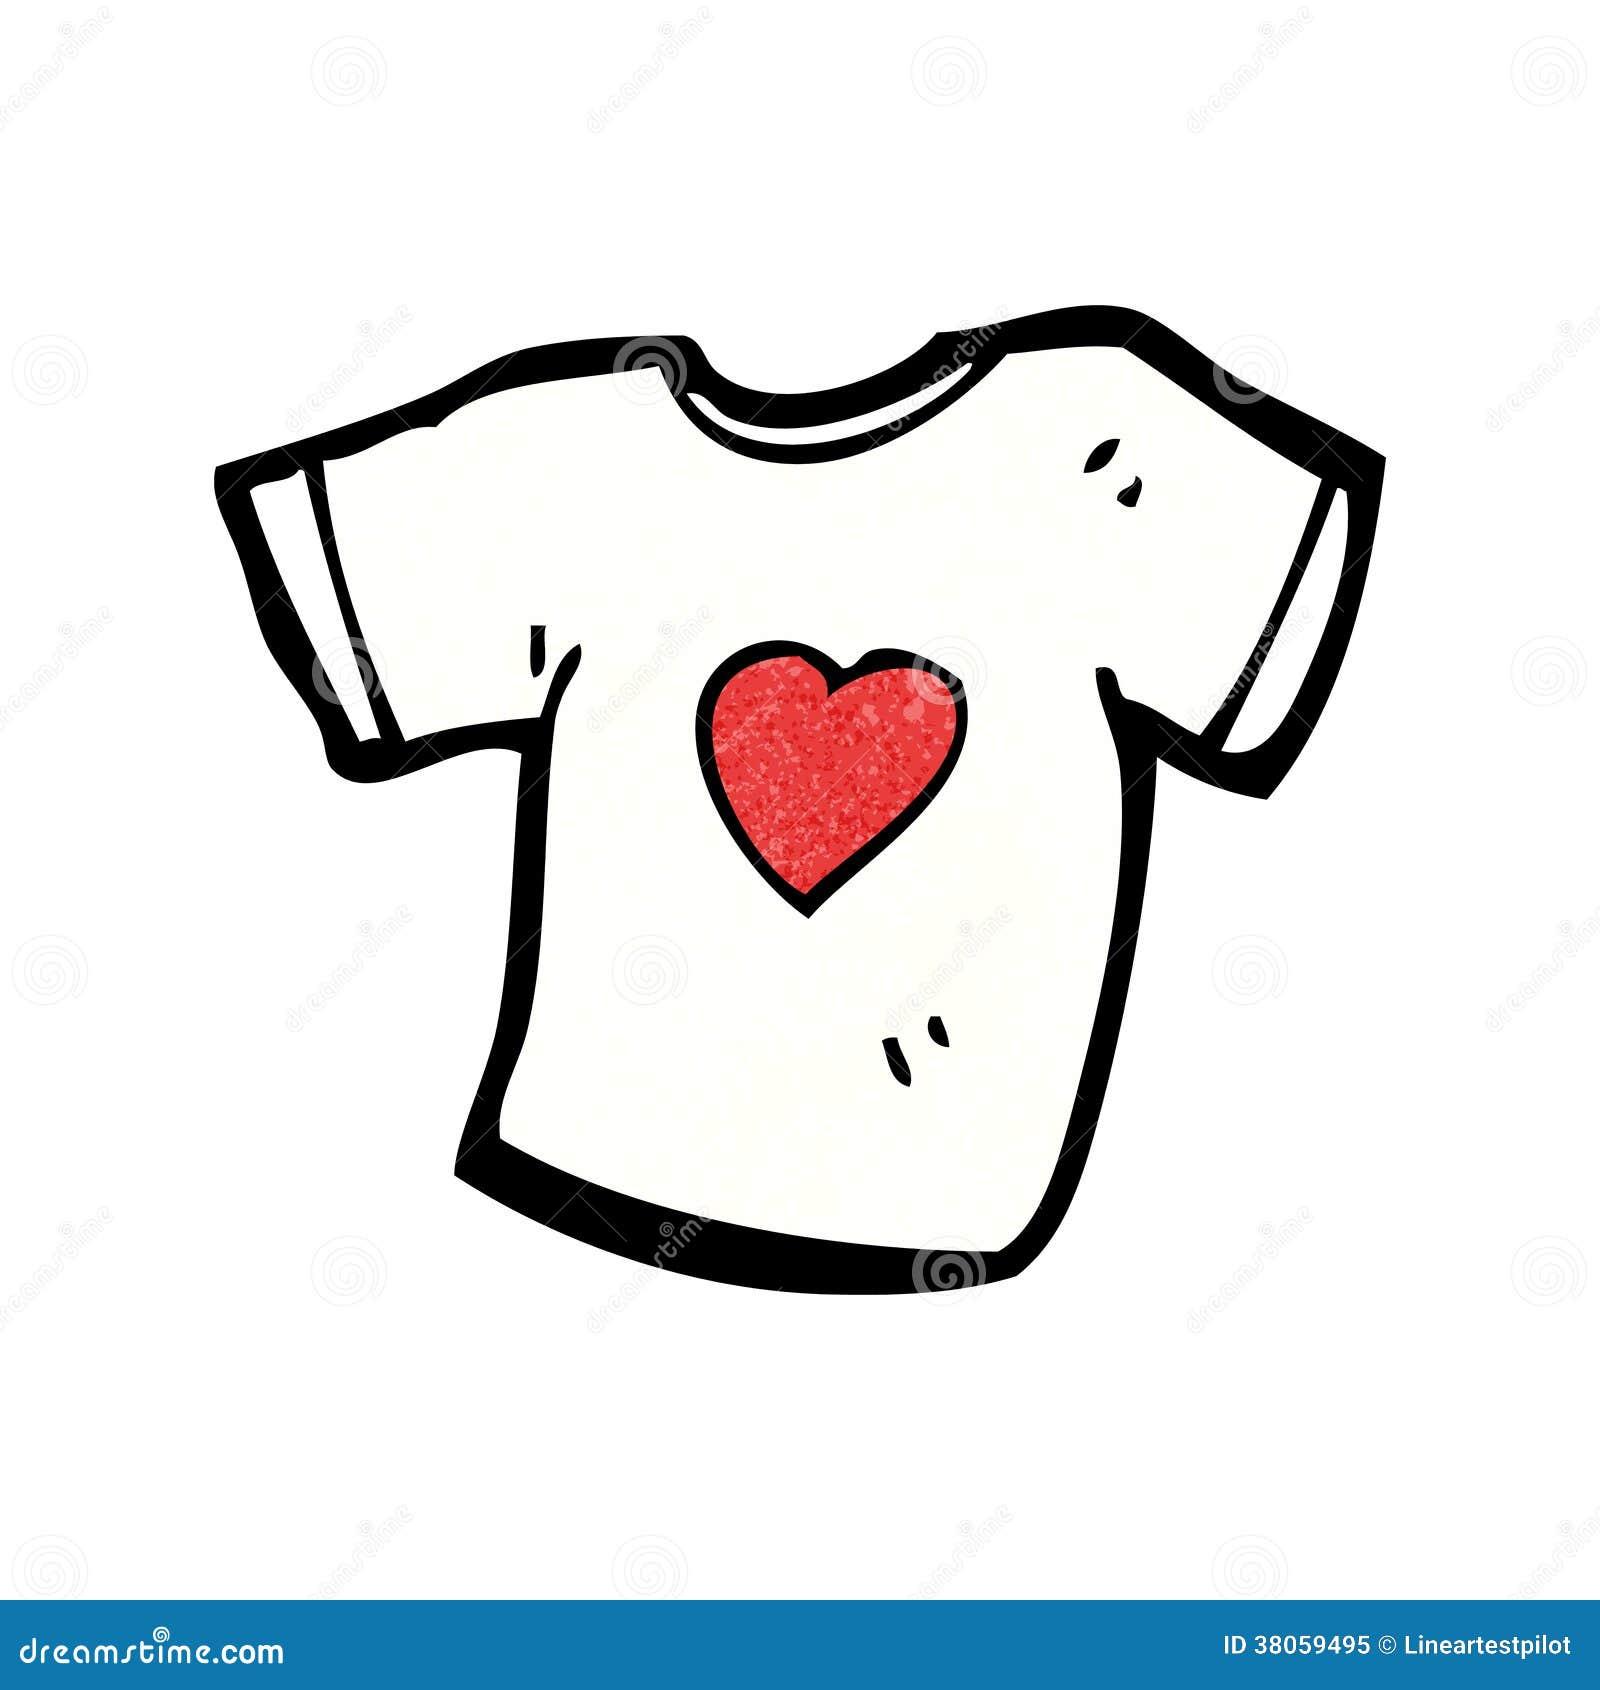 Love Heart Tee Shirt Cartoon Royalty Free Stock Photo - Image ...